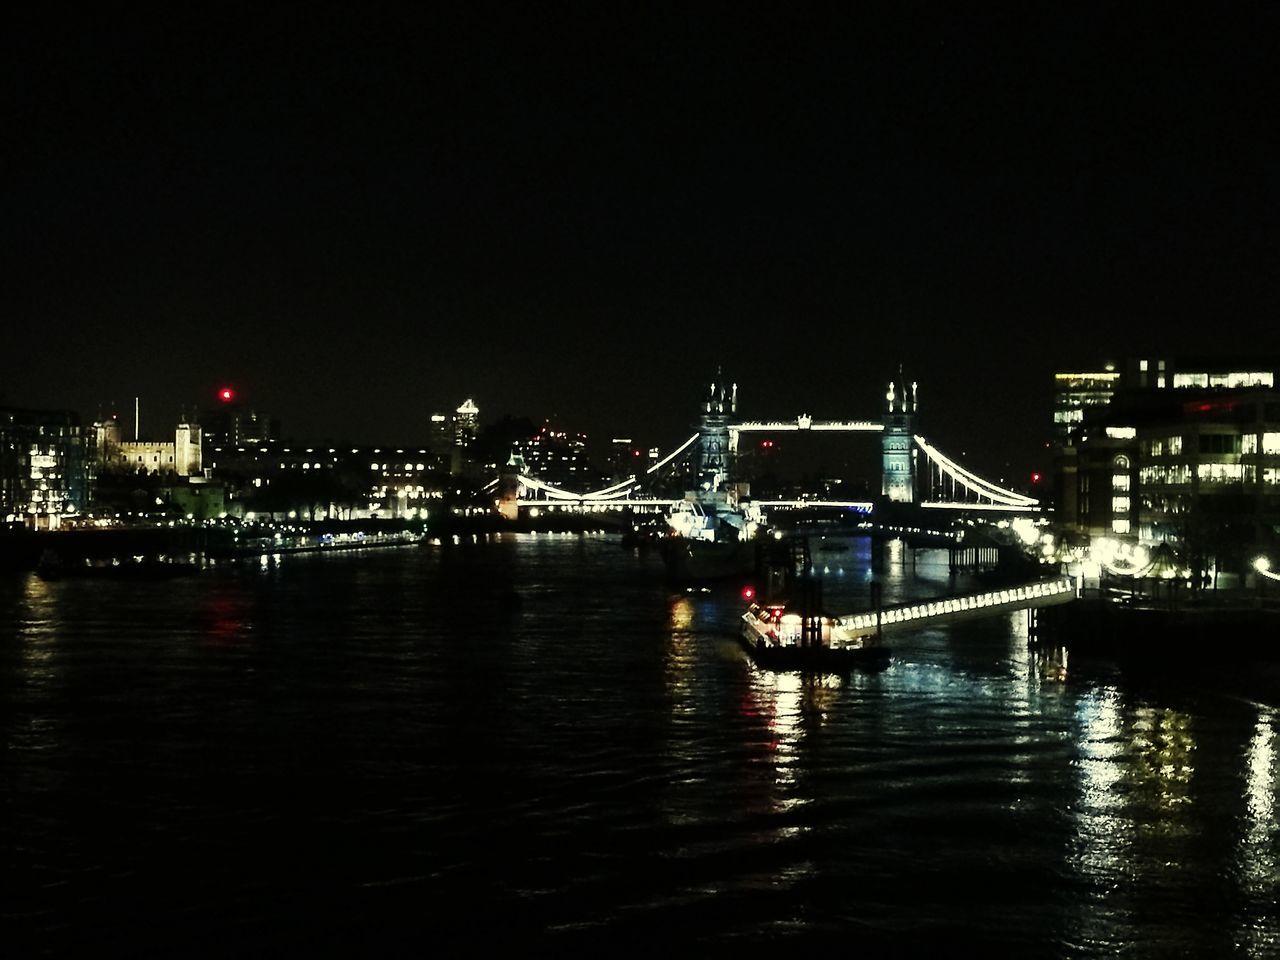 London City Of London Bridge Illuminated Architecture Travel Destinations Cityscape Night City River Thames Thamesriver